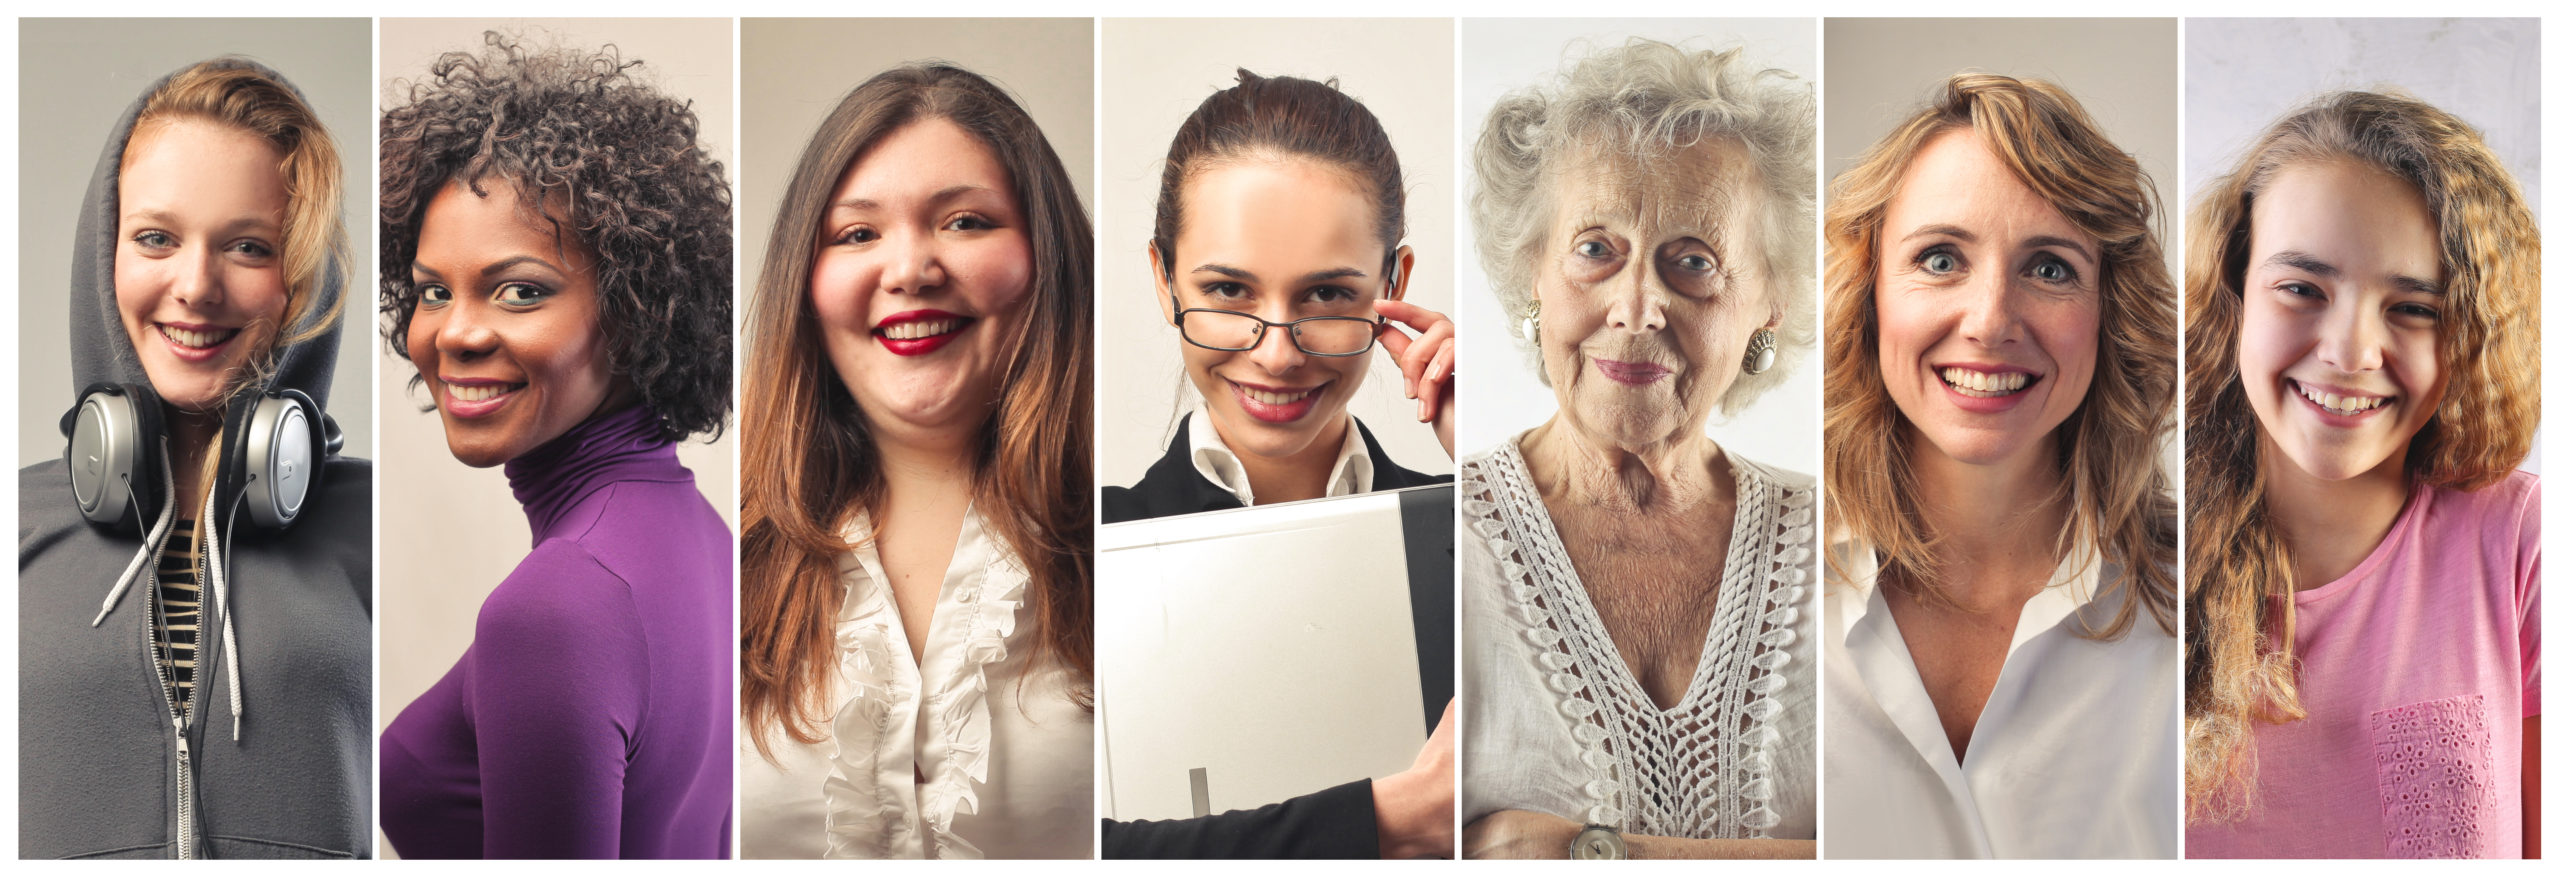 Collage Generational Women